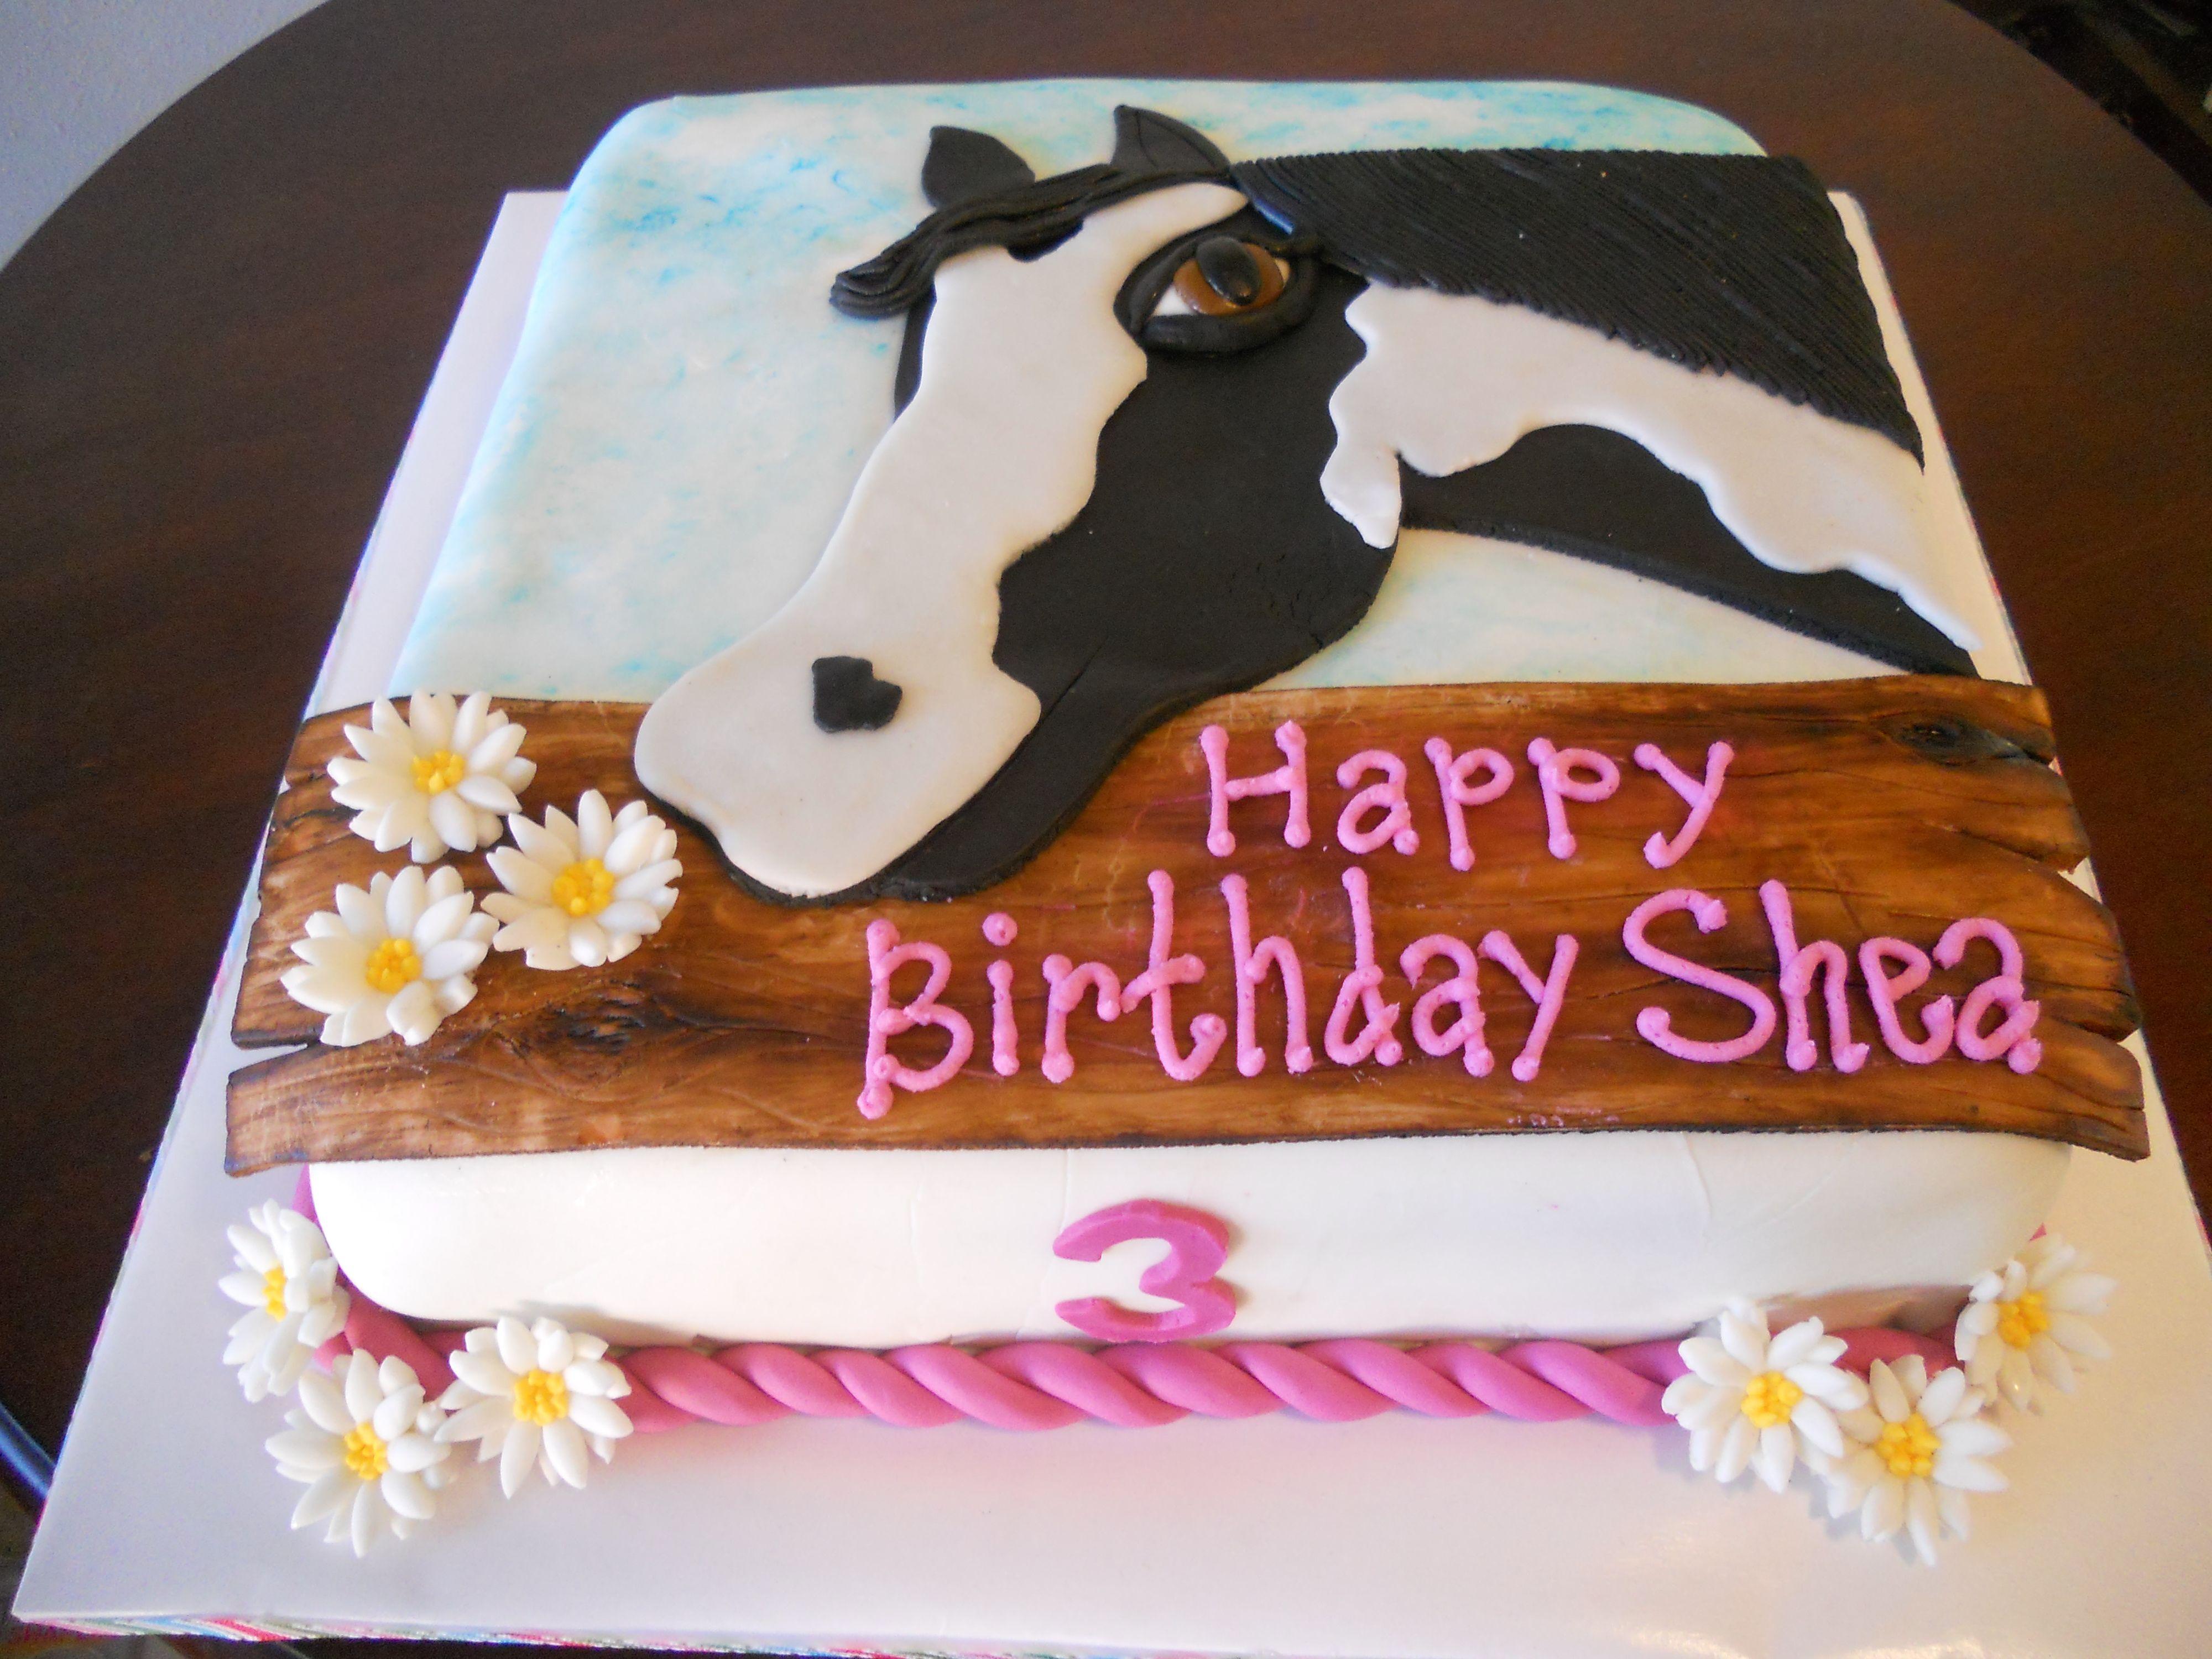 Birthday Cake Decorations Horses : So so so sweet for you one day. @Katiyah Ceynowa Ceynowa ...